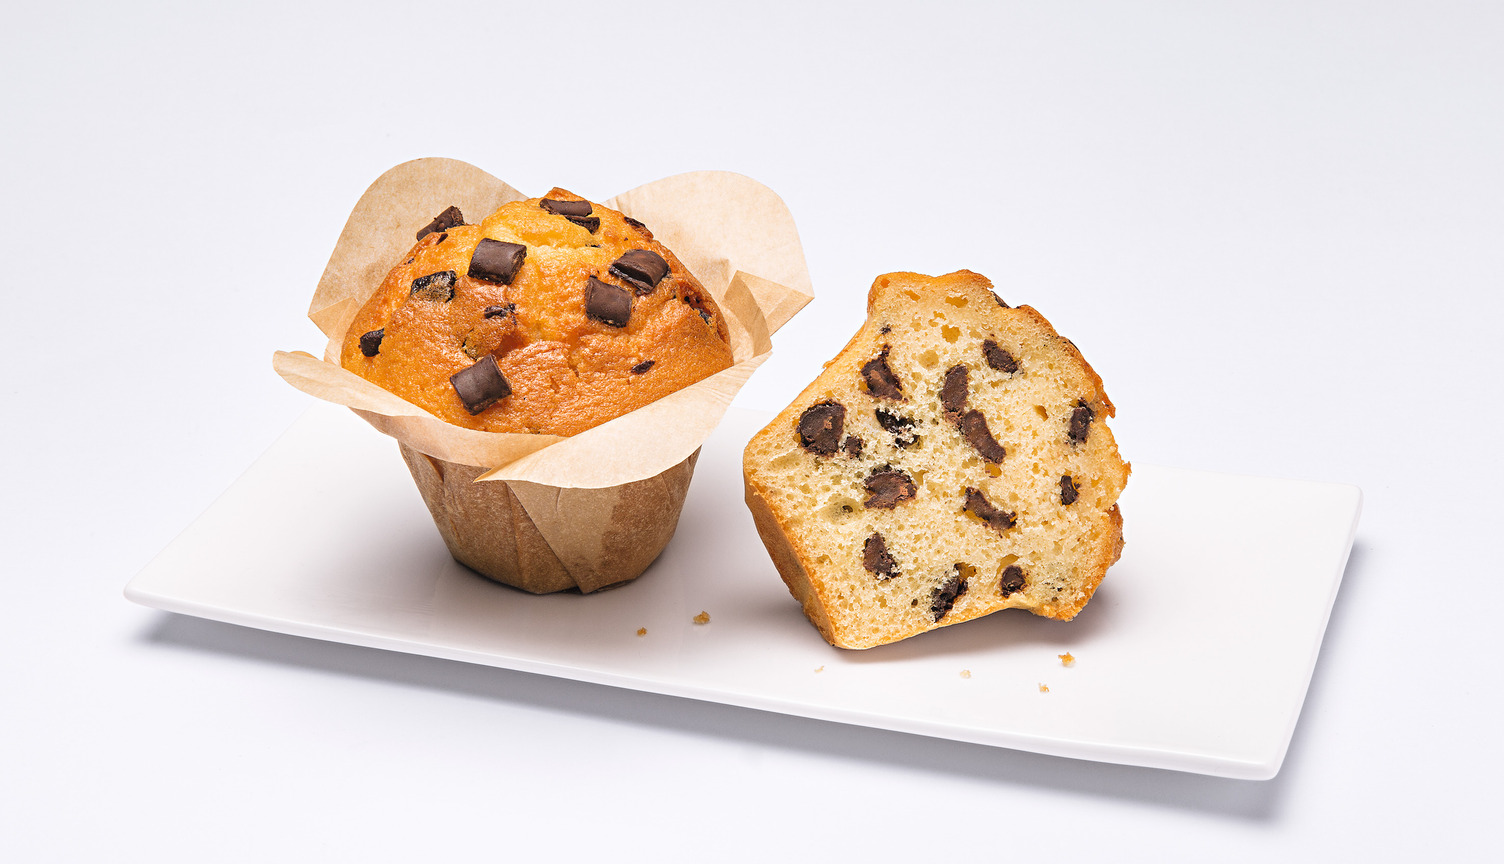 NESTLE SCHOELLER Chocolate Chunk Muffin 100 g